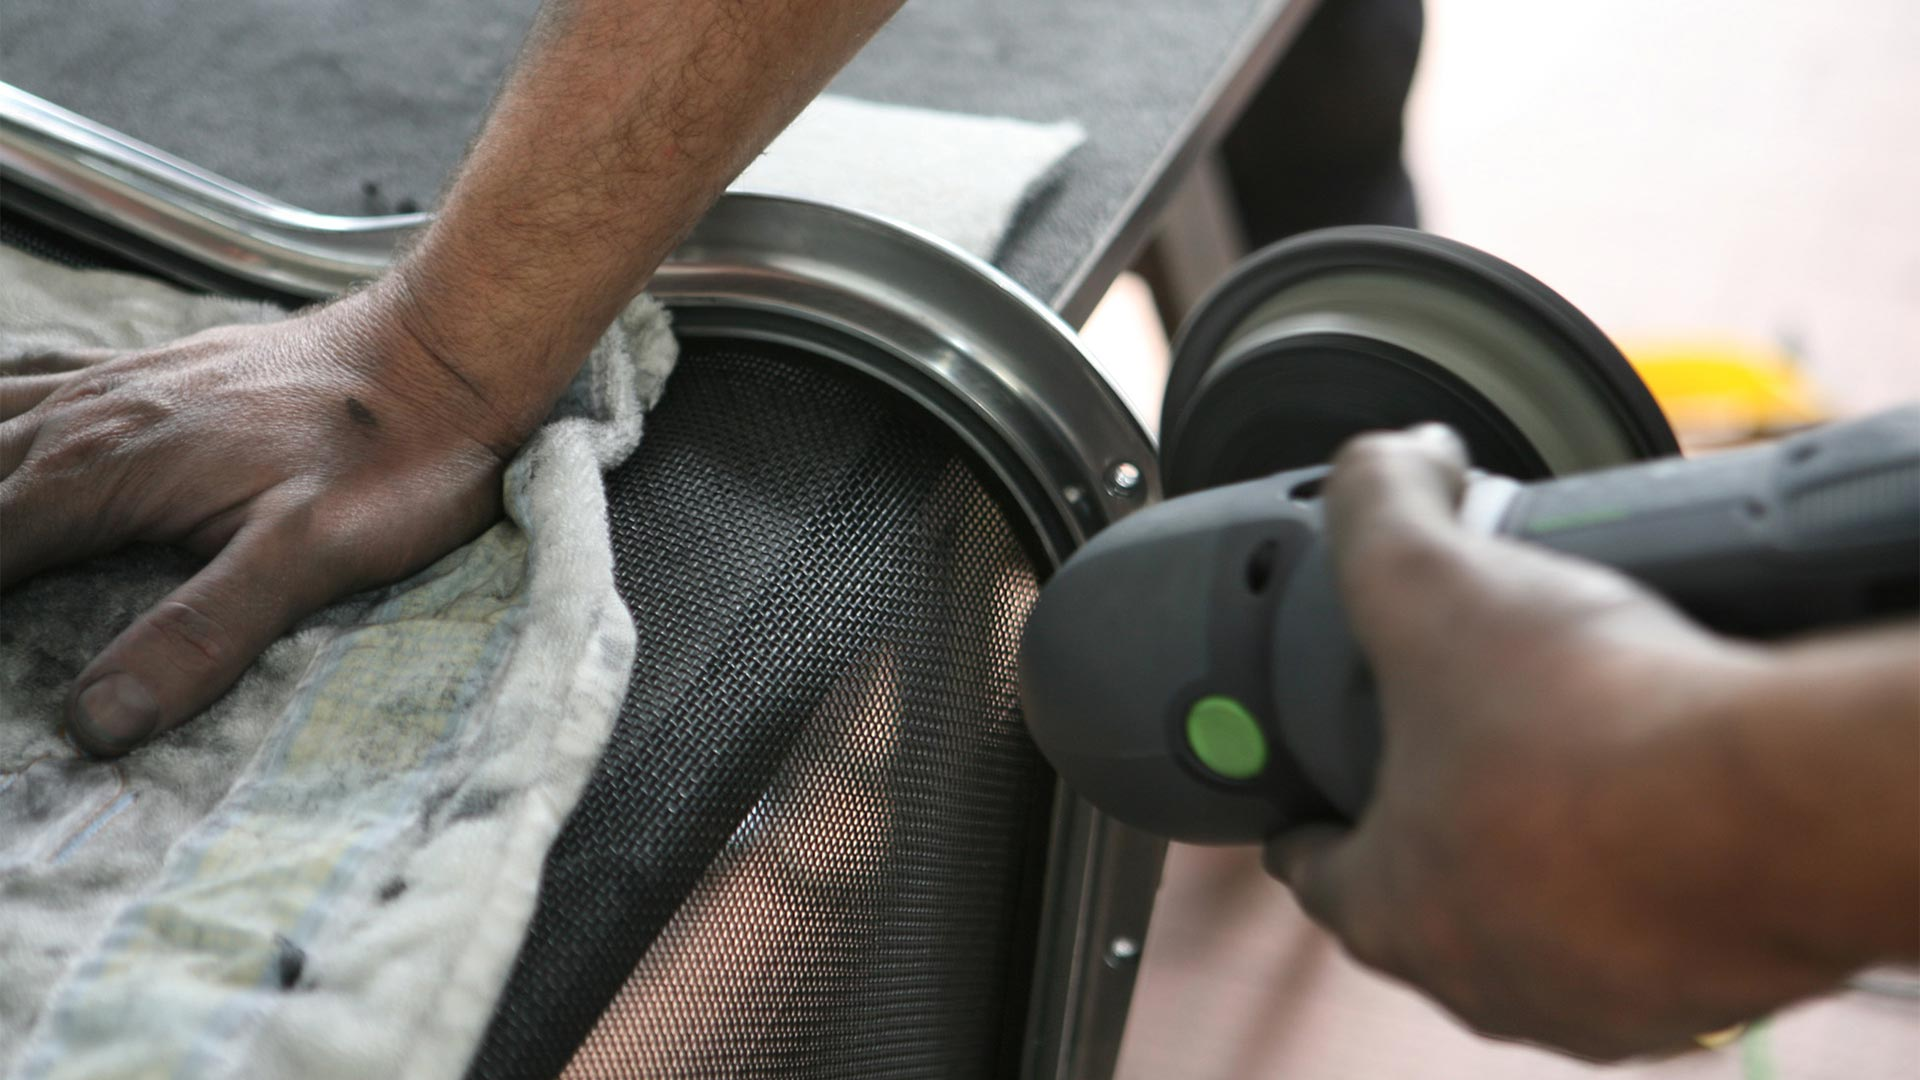 Vitra Aufbereitung Eames Alu Chair in Berlin bei steidten+02